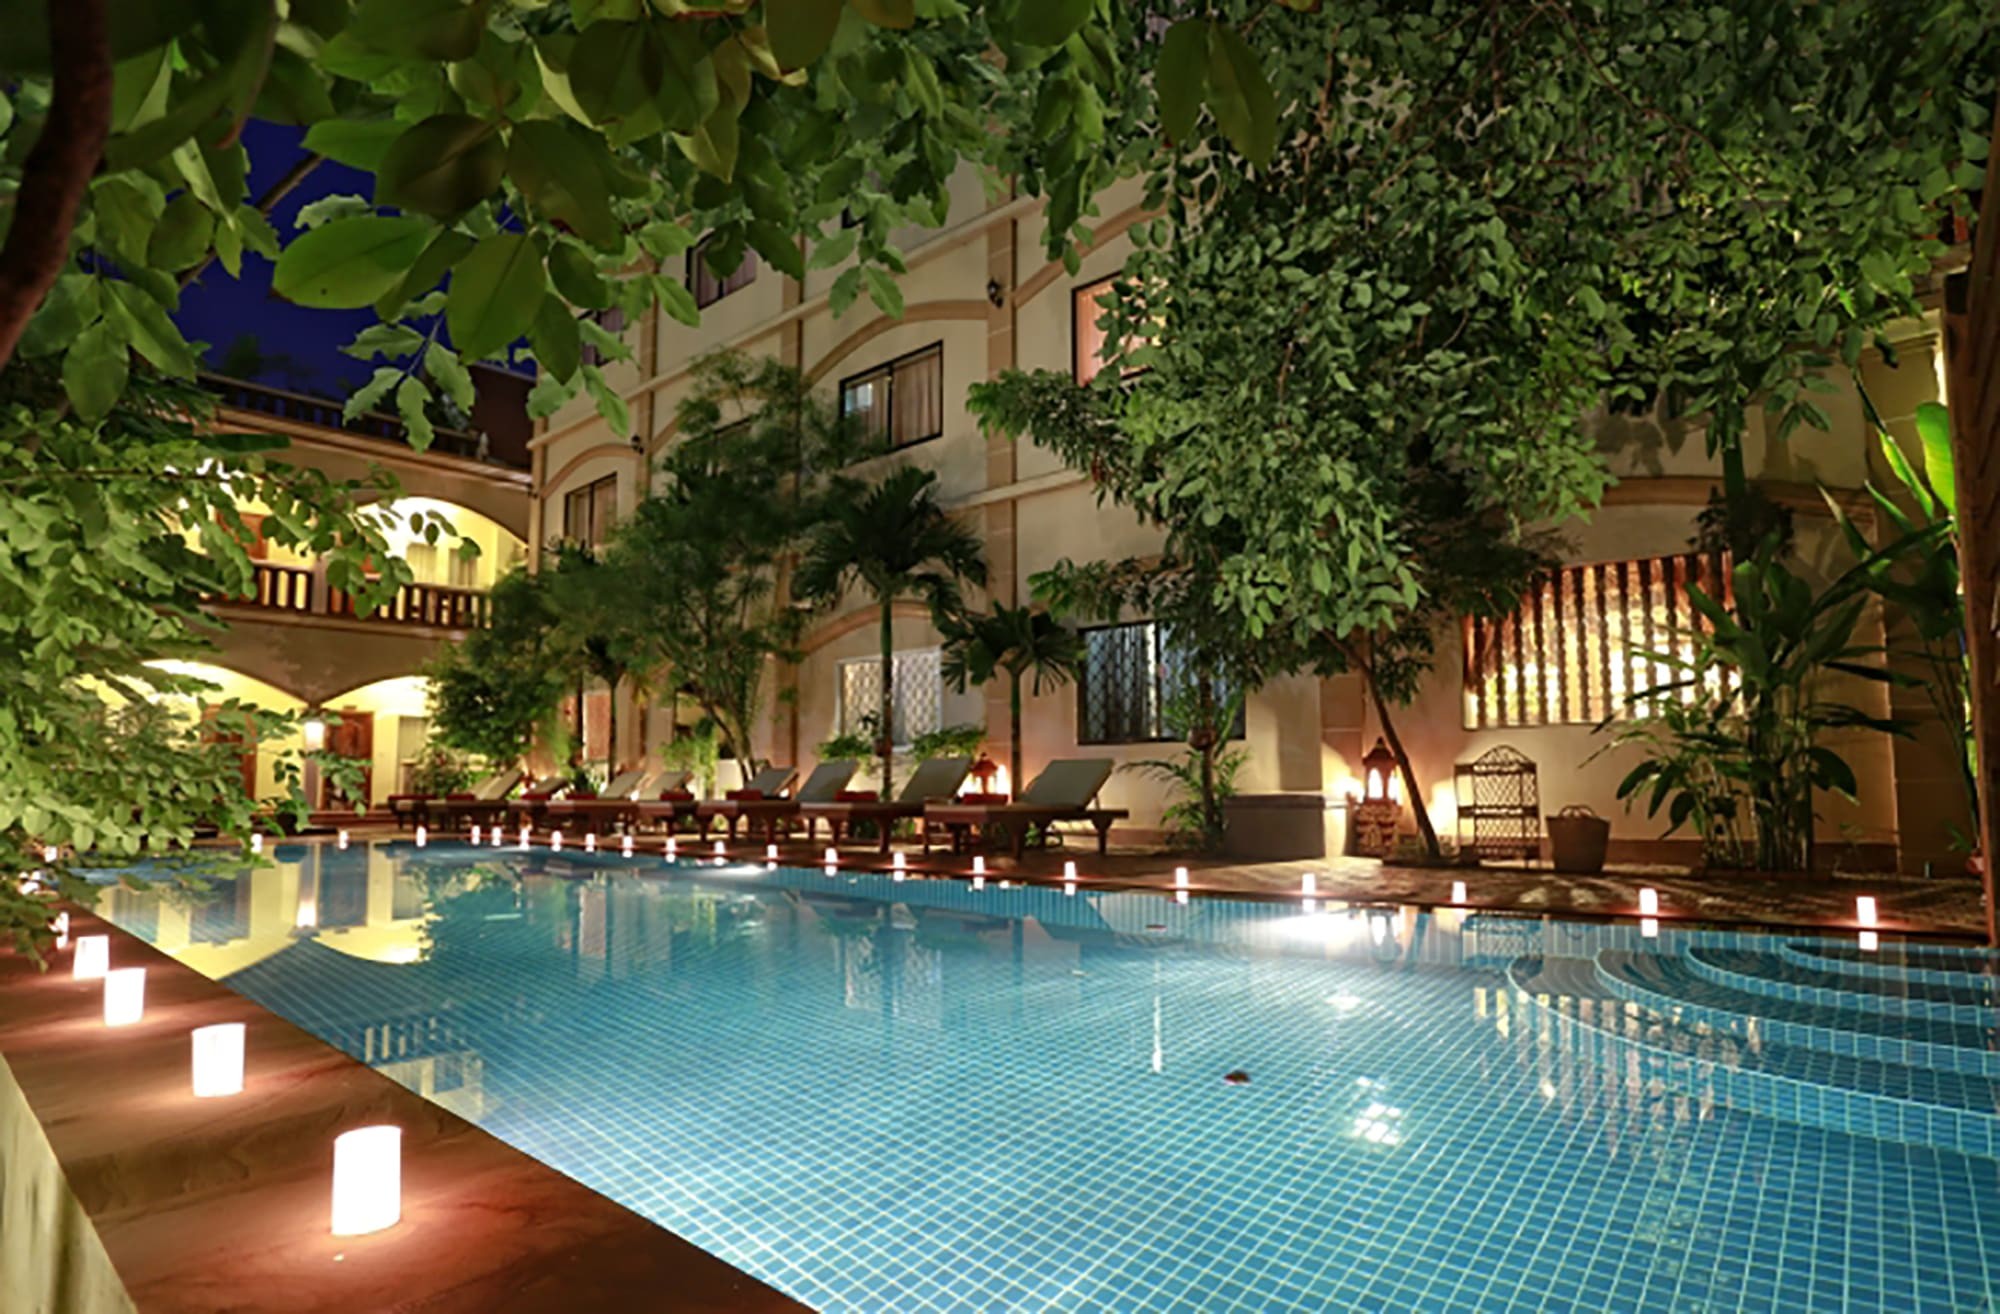 HOSTEL - Forest King Hotel